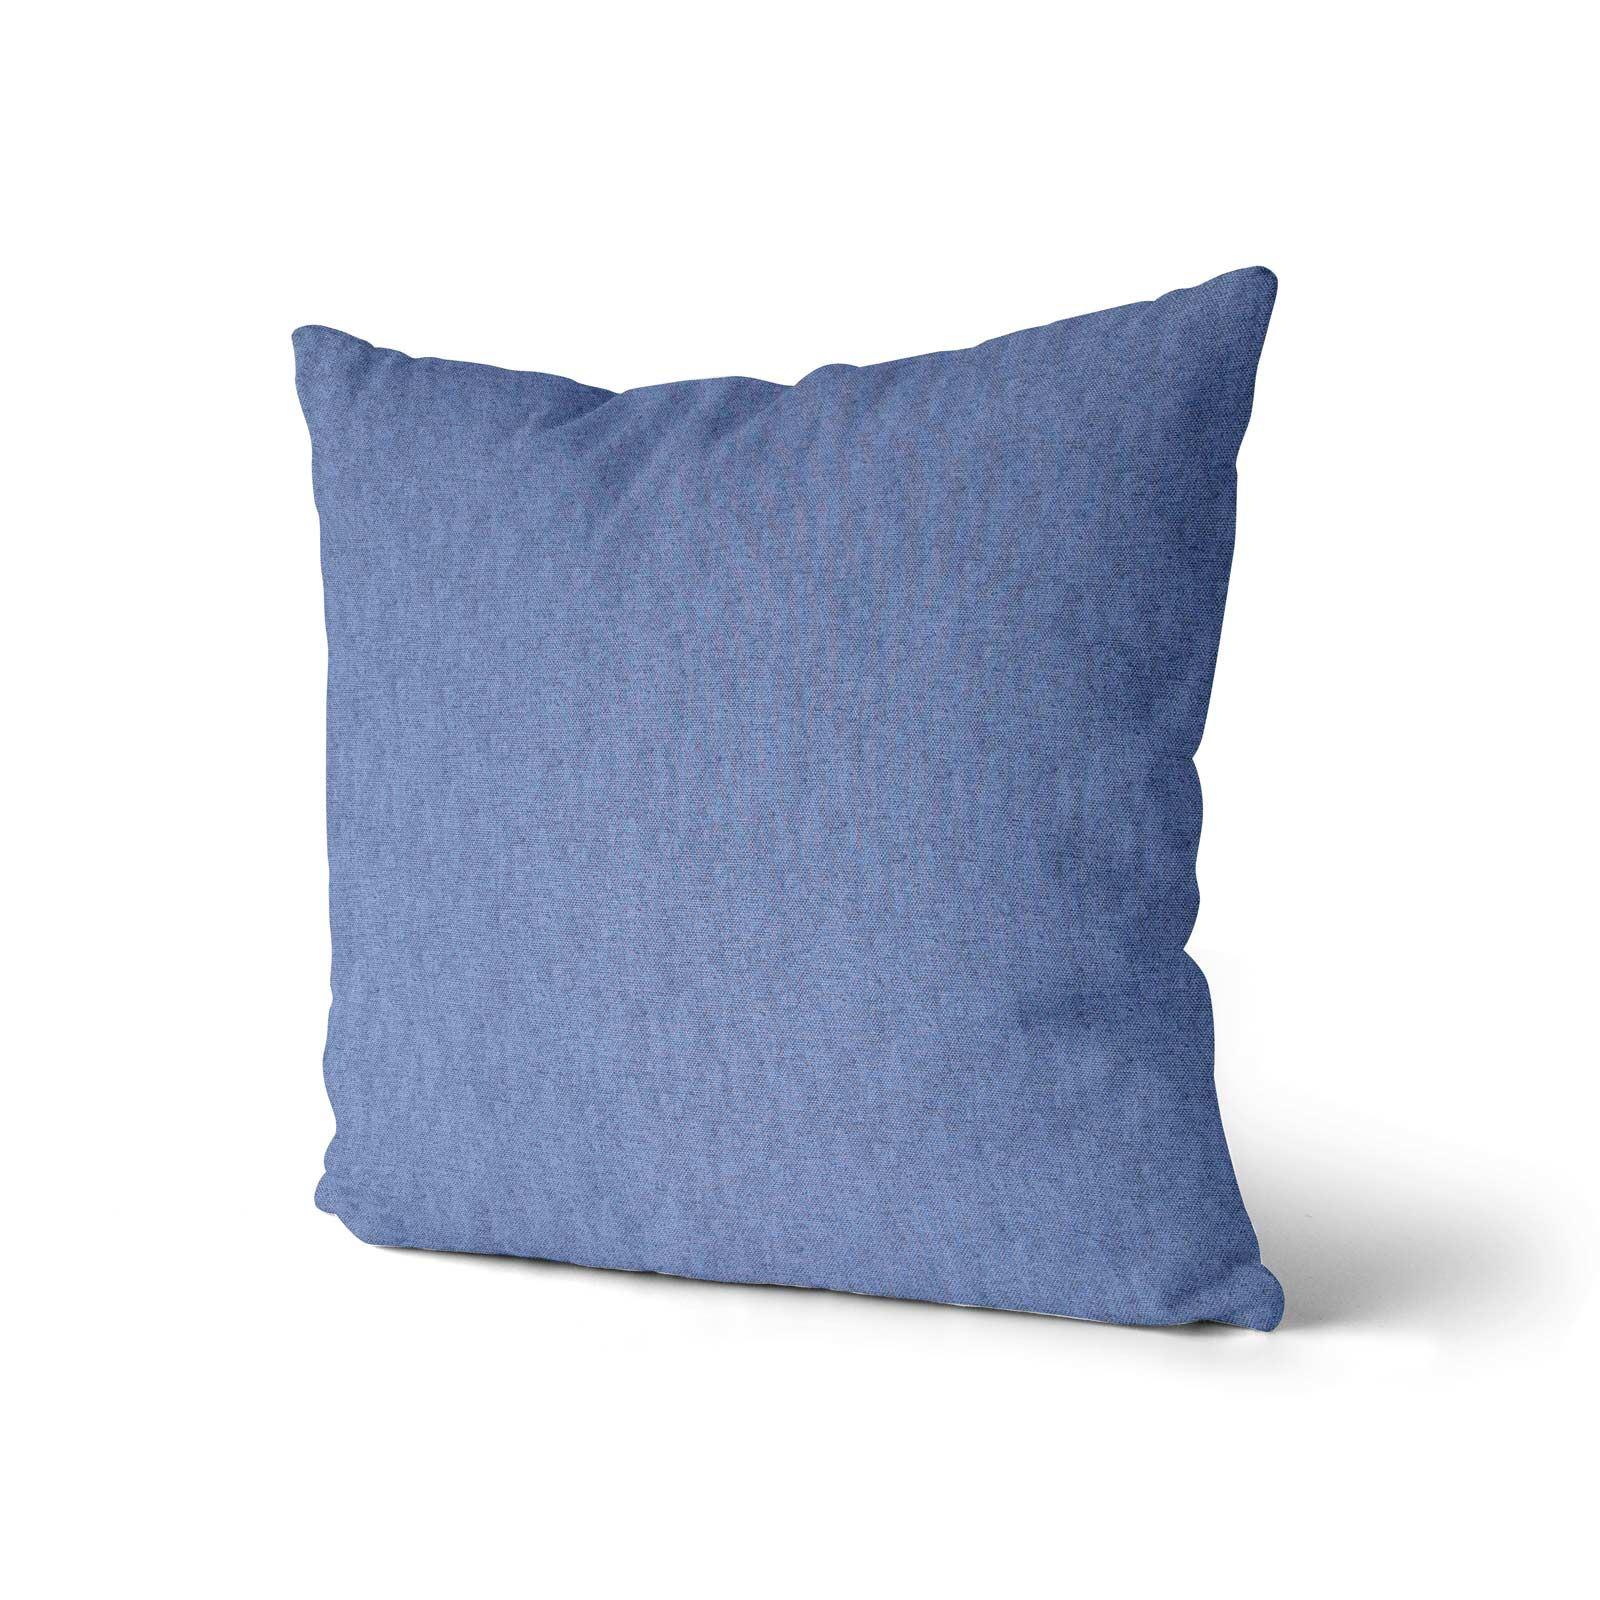 Crema-Color-Foglia-Di-Te-Blu-Uovo-D-039-anatra-Cuscino-Copre-18-034-x-18-034-45-CM-x-45-cm-COVER miniatura 49